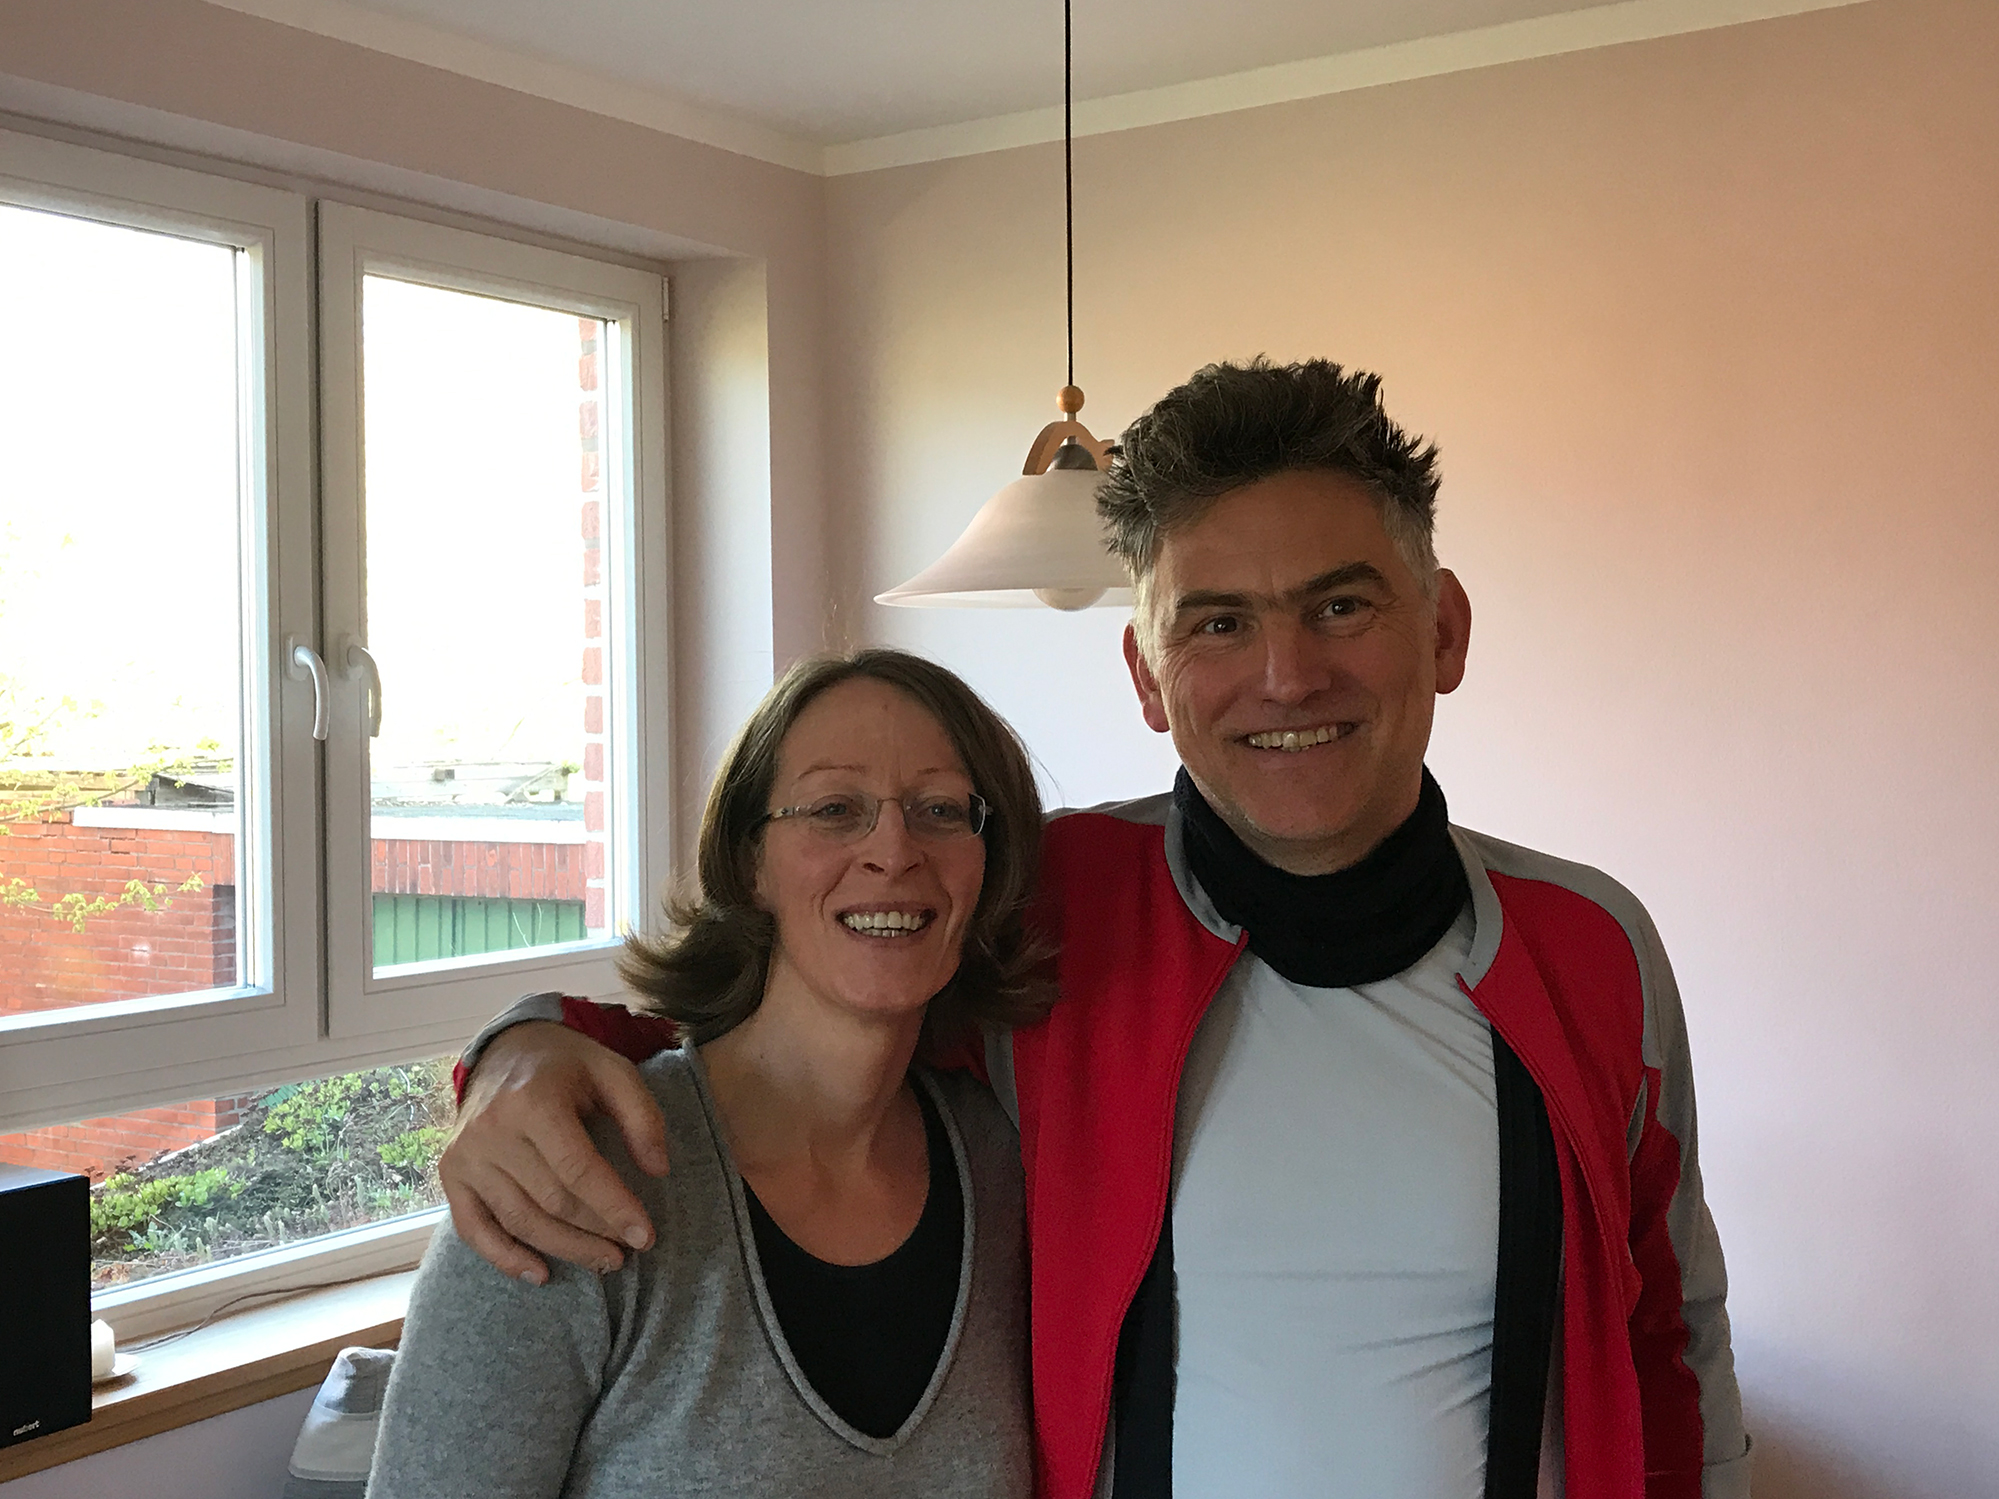 Bernard and Andrea, Lüneburg